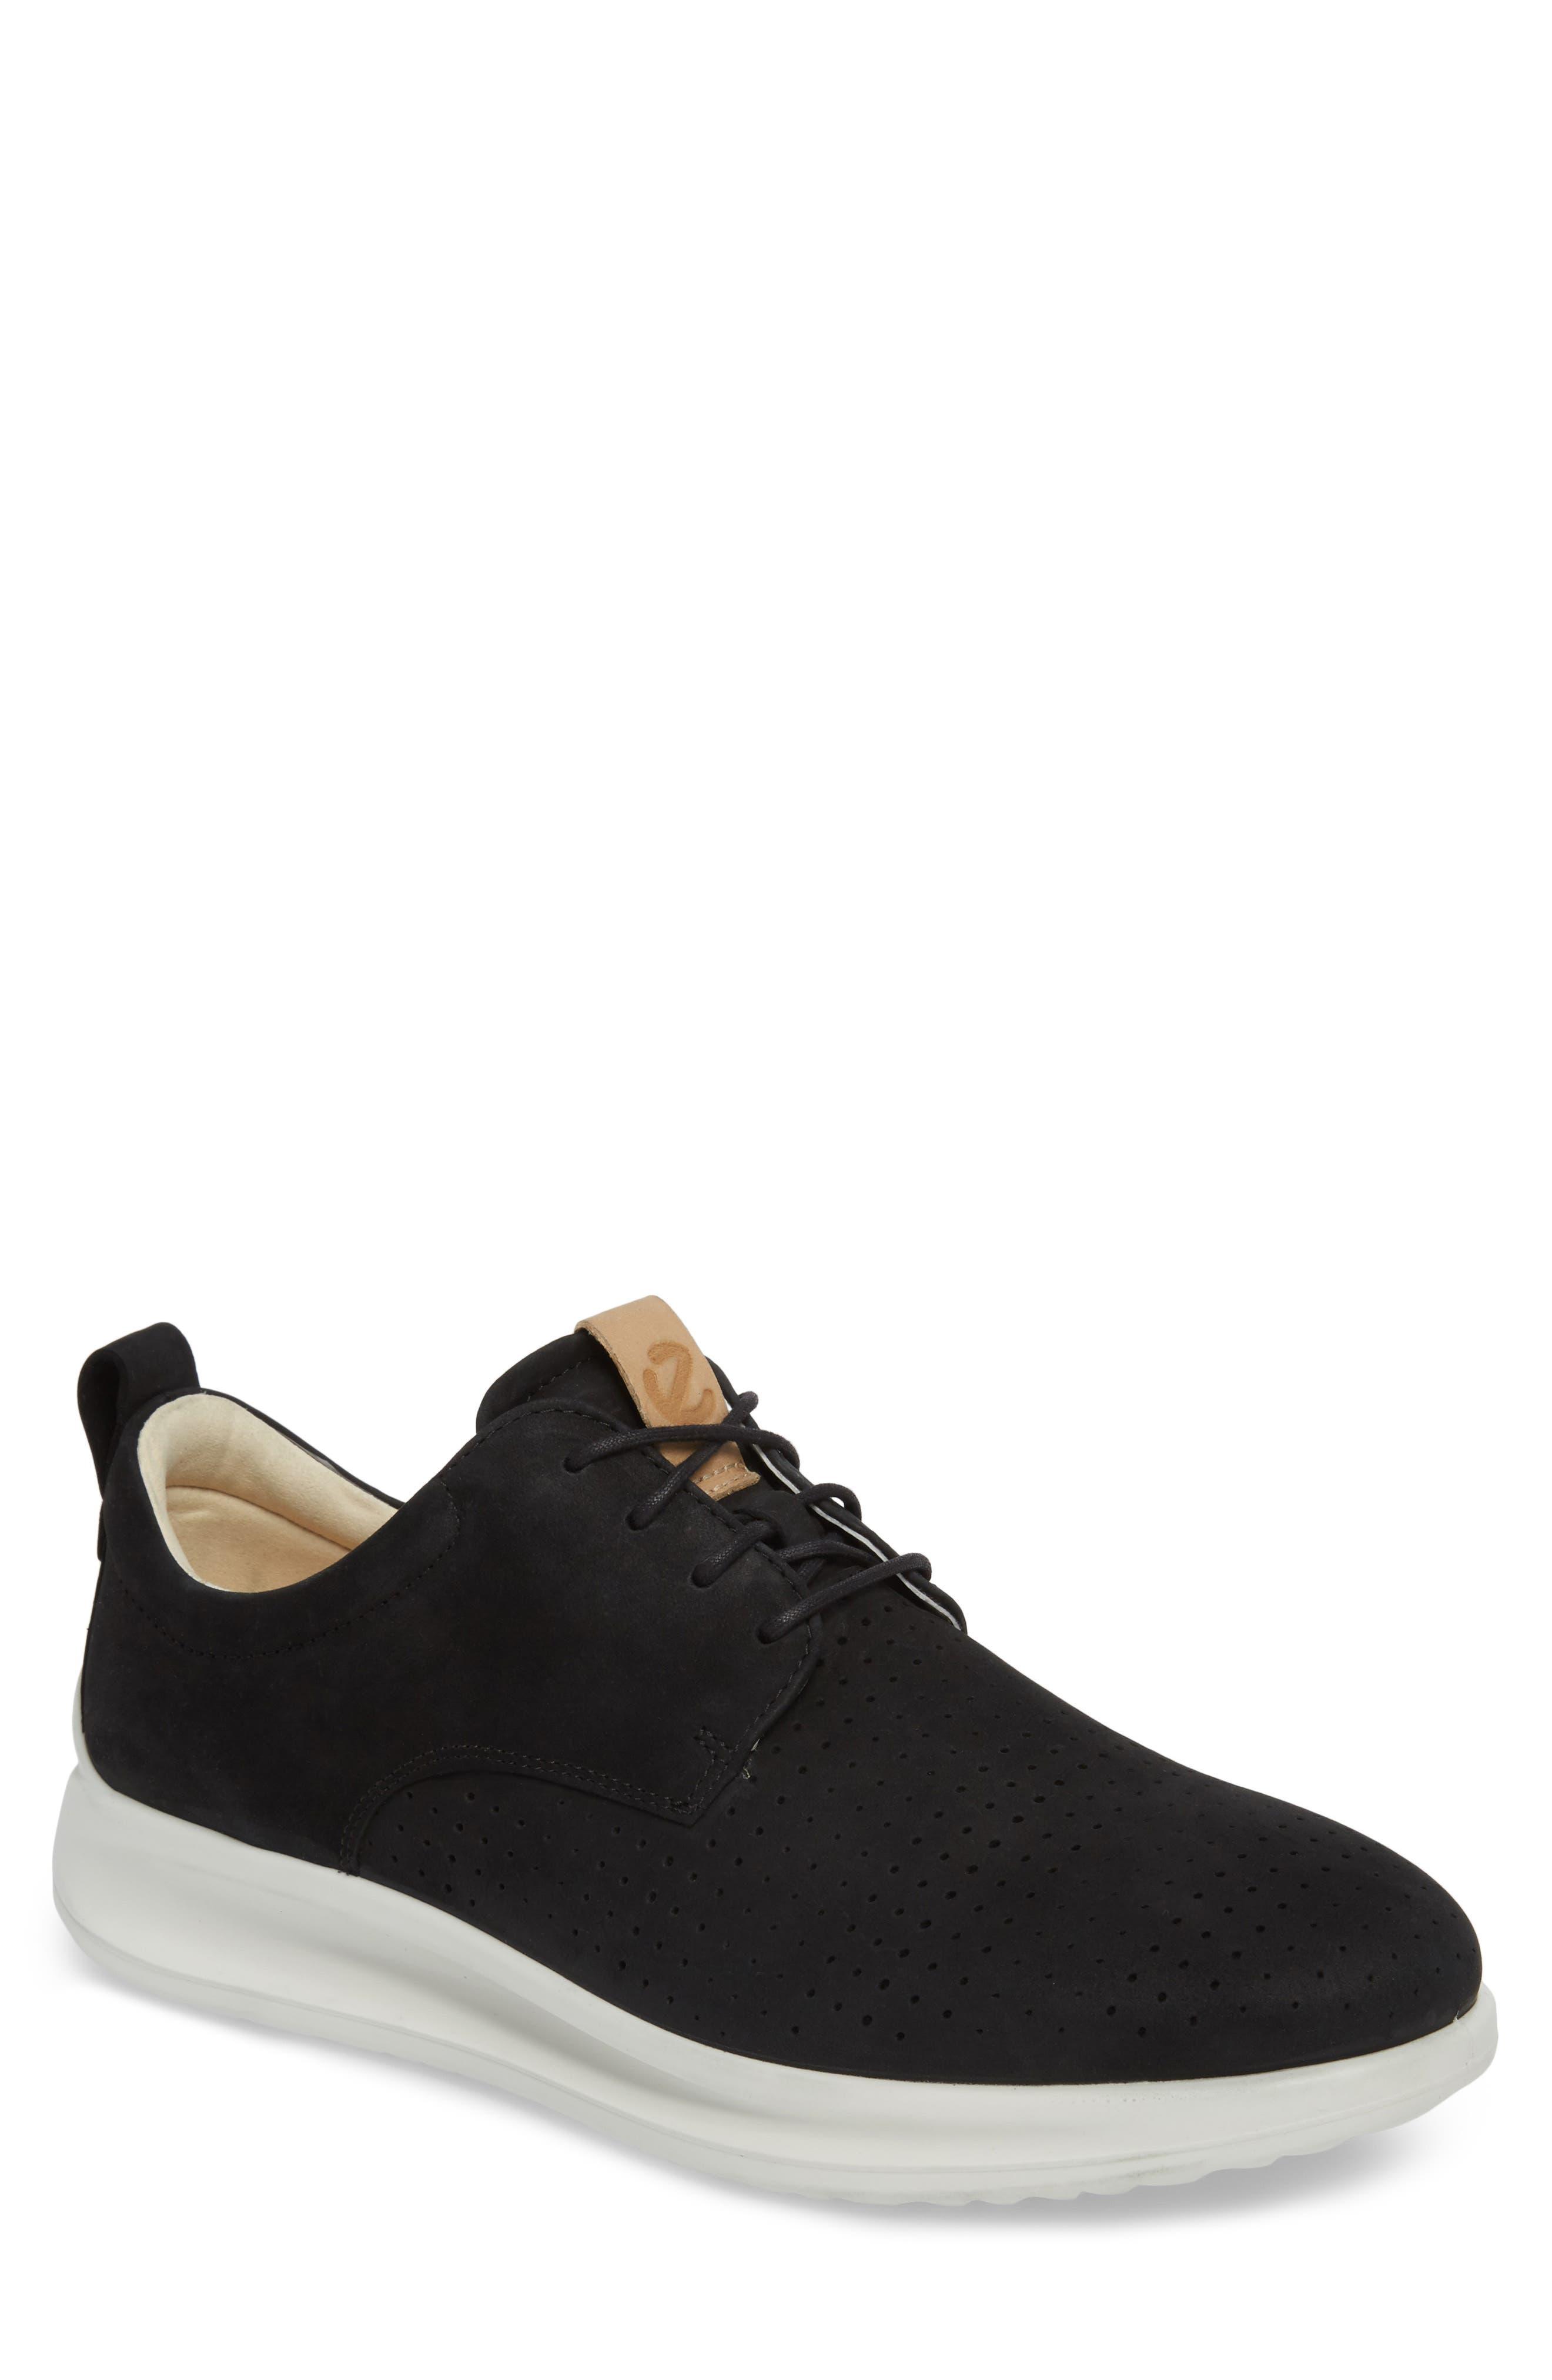 ECCO Aquet Sneaker, Main, color, 007